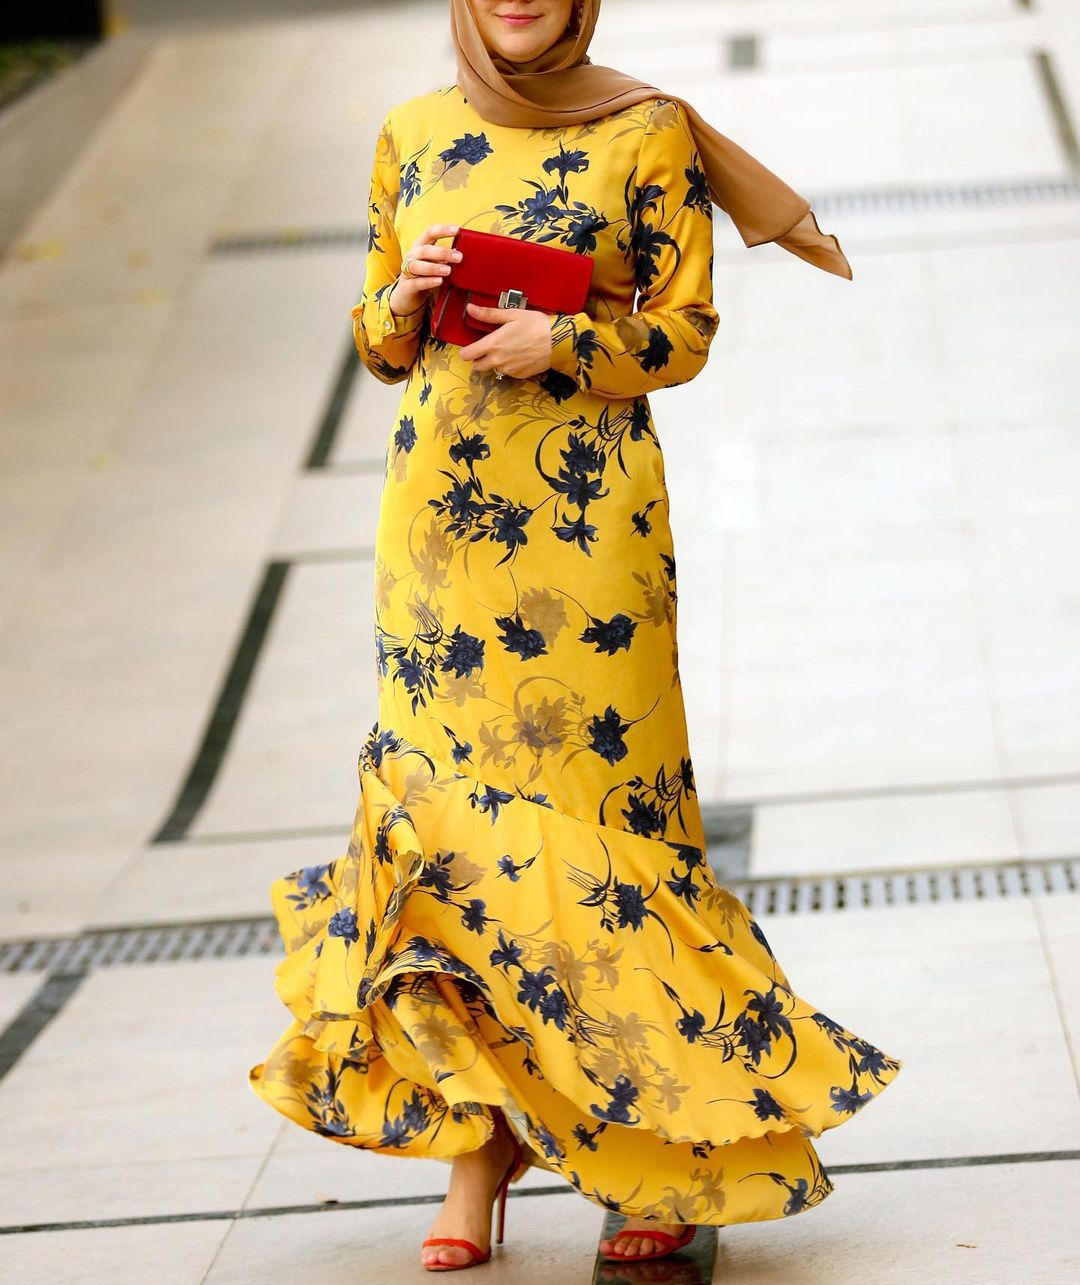 Eid Mubarak Abayas for Women Turkish Dresses Muslim Dubai Abaya Moroccan Caftan Hijab Dress Islam Clothing Vestidos Kaftan Robe